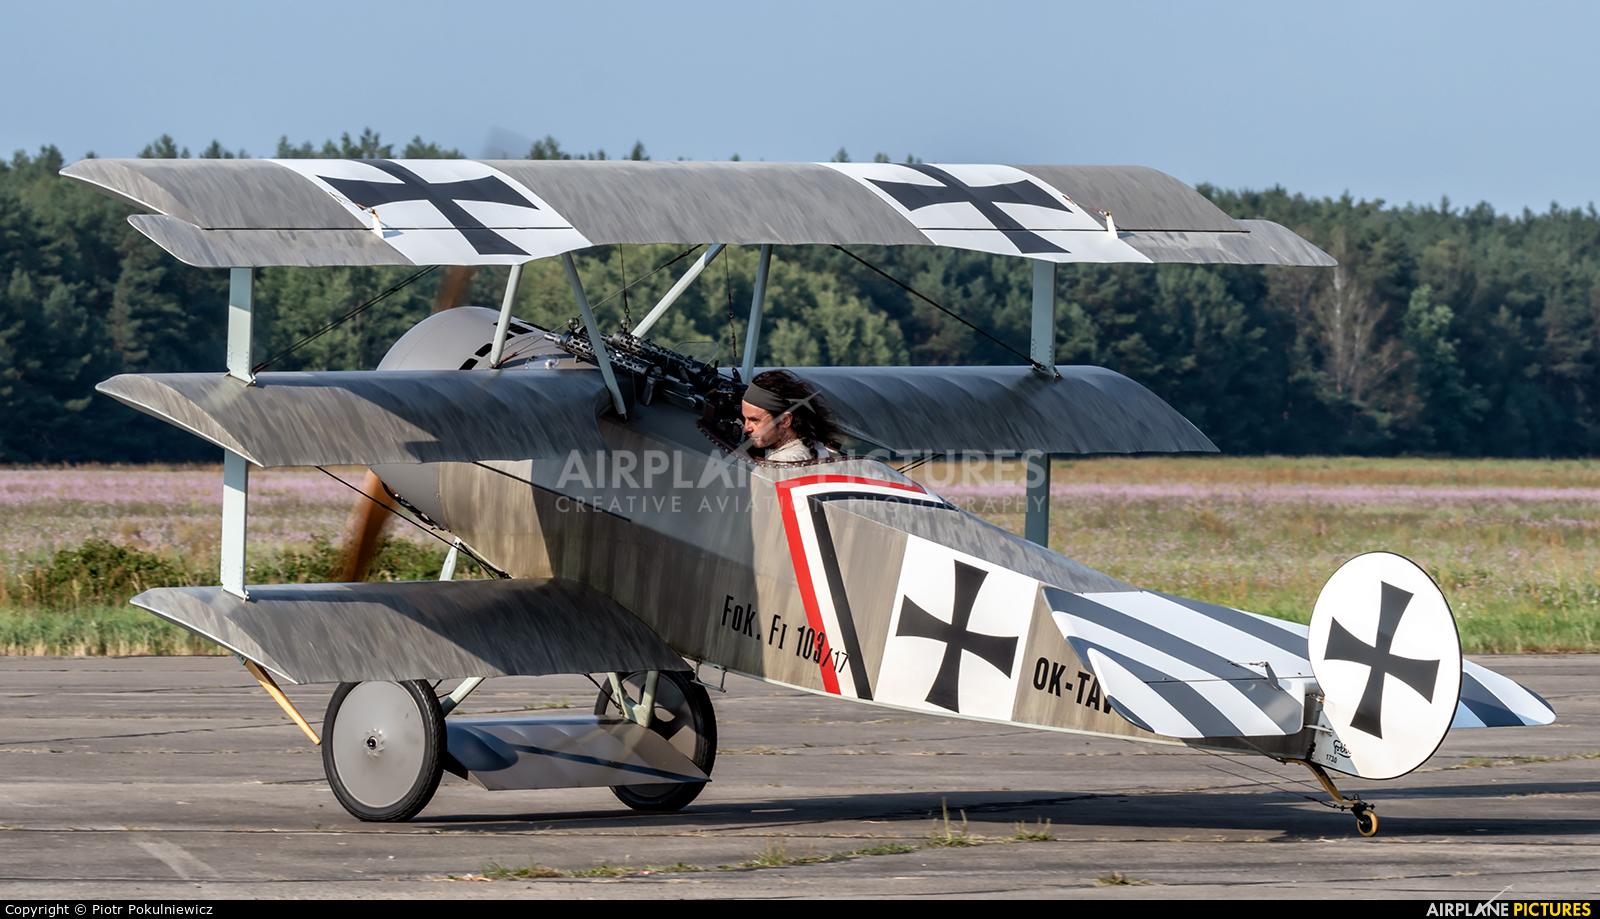 Private OK-TAV58 aircraft at Piła